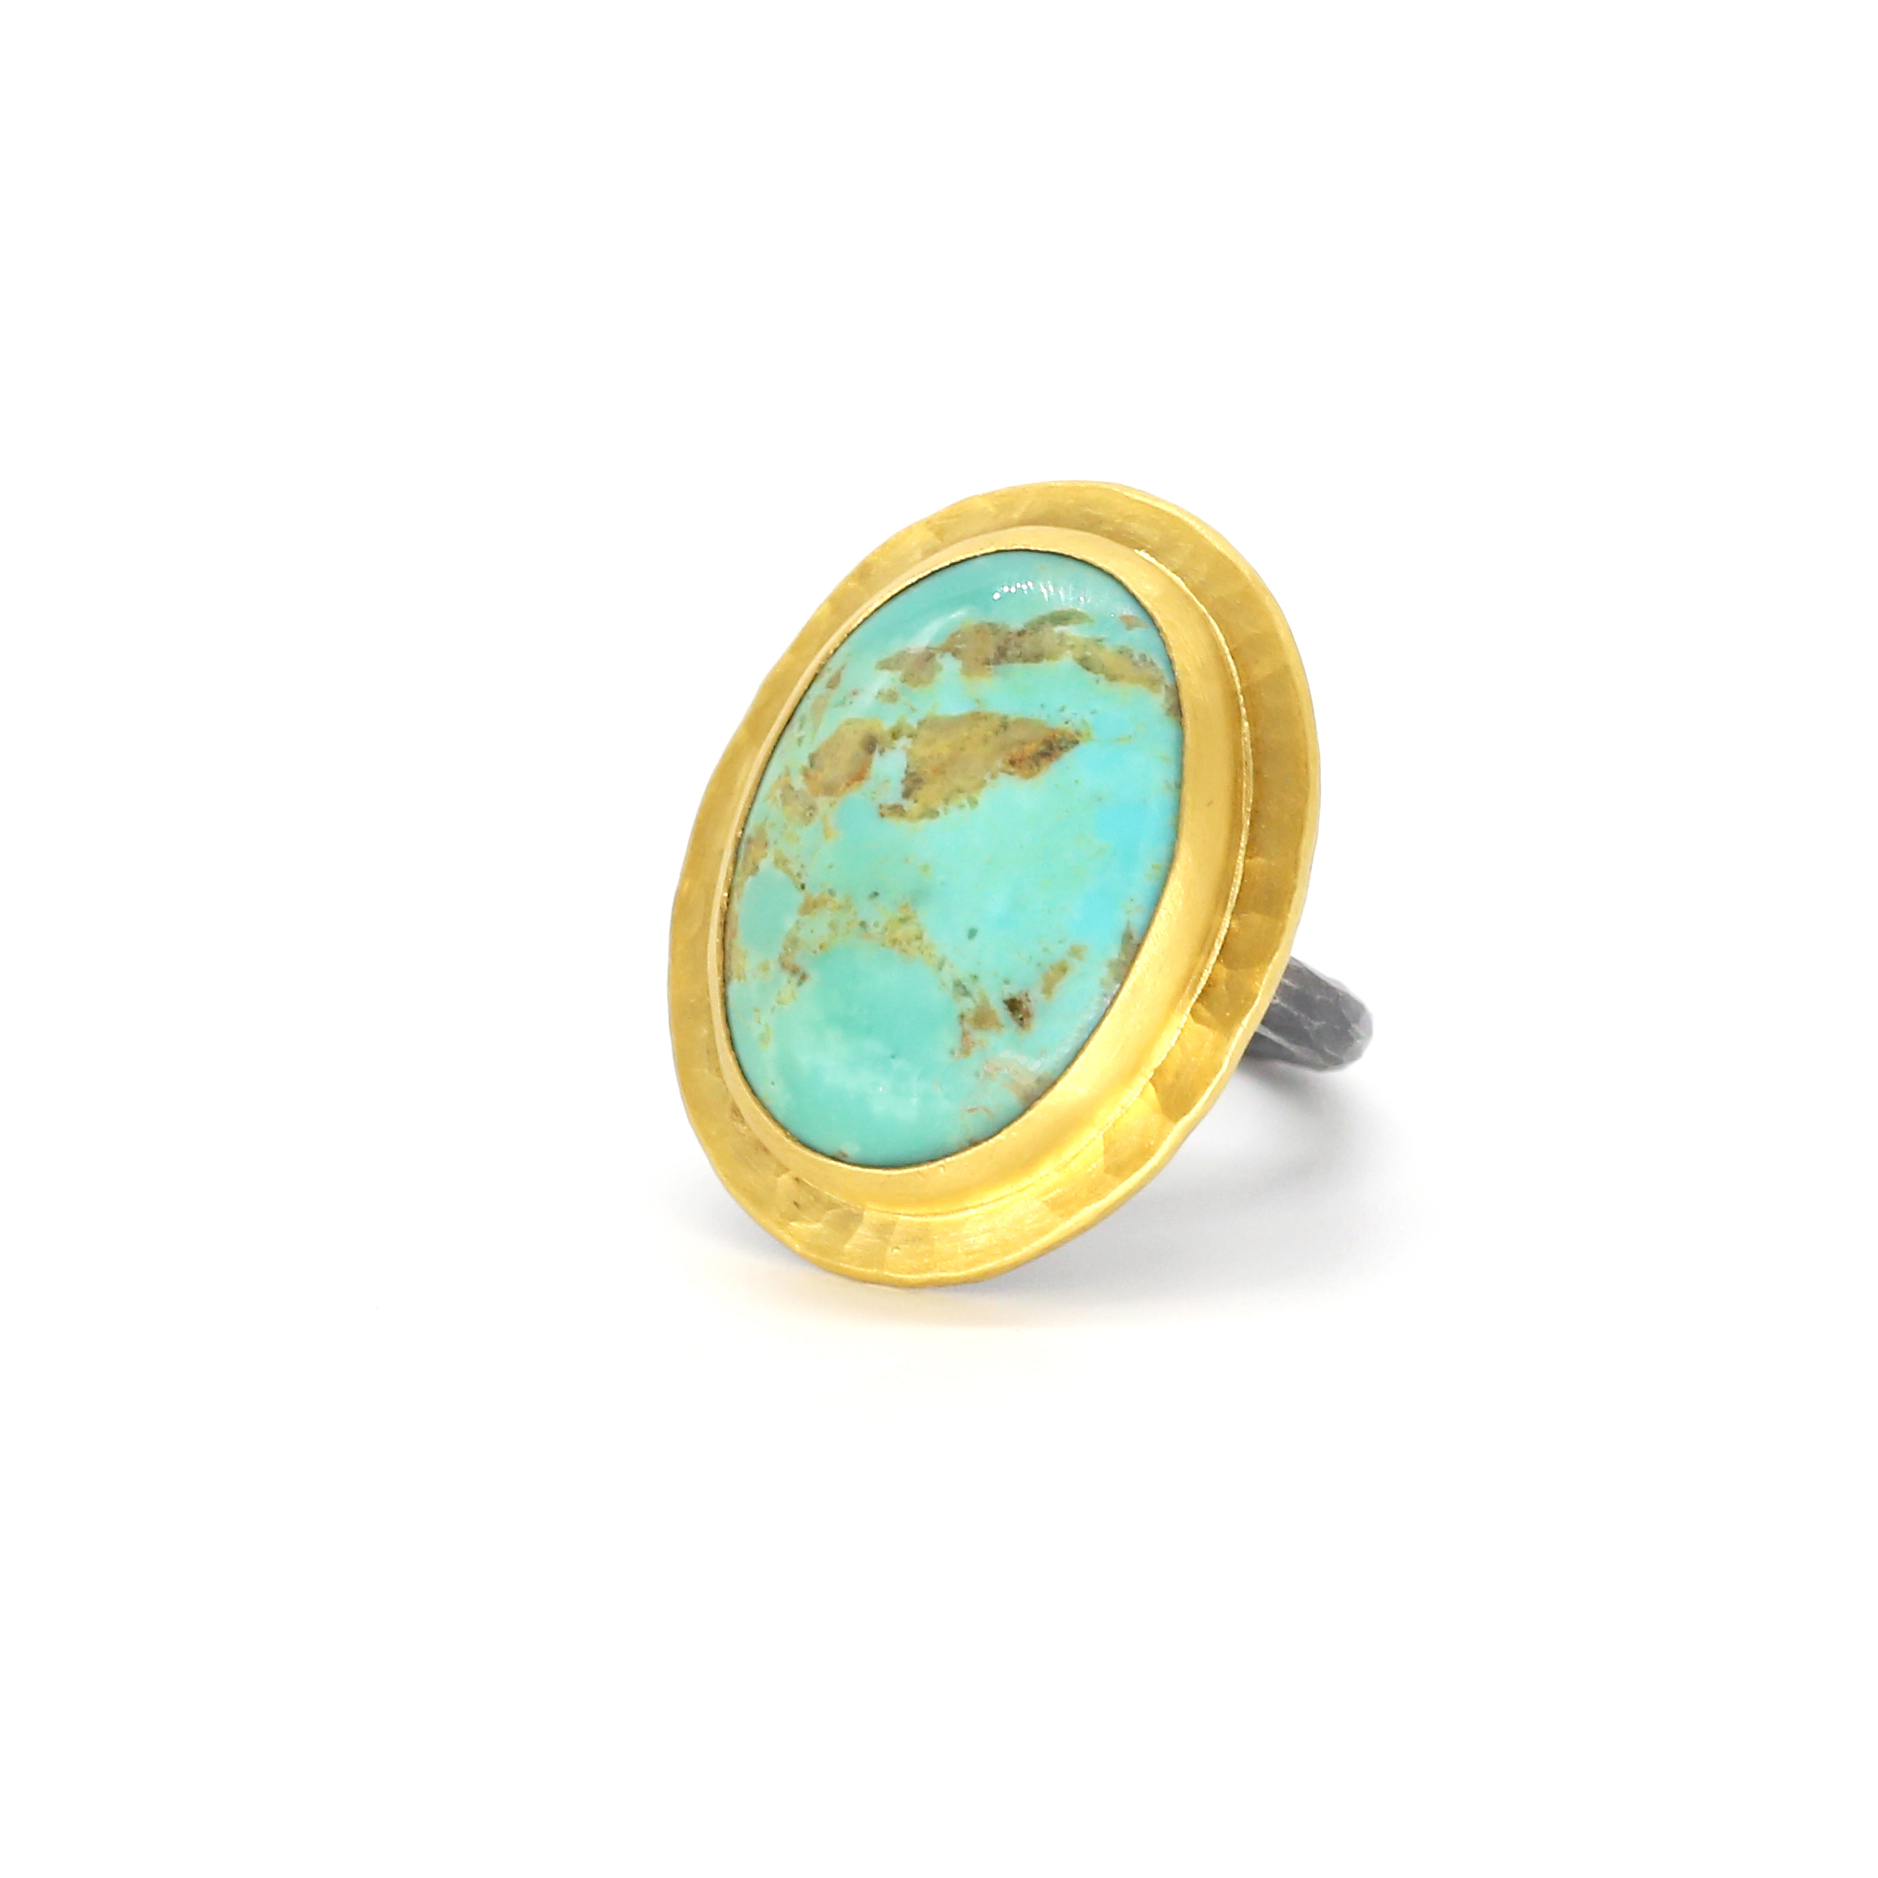 Turquoisering,gold ring,turquiose ring gold,turquoise,24k gold, Turquoise Ring